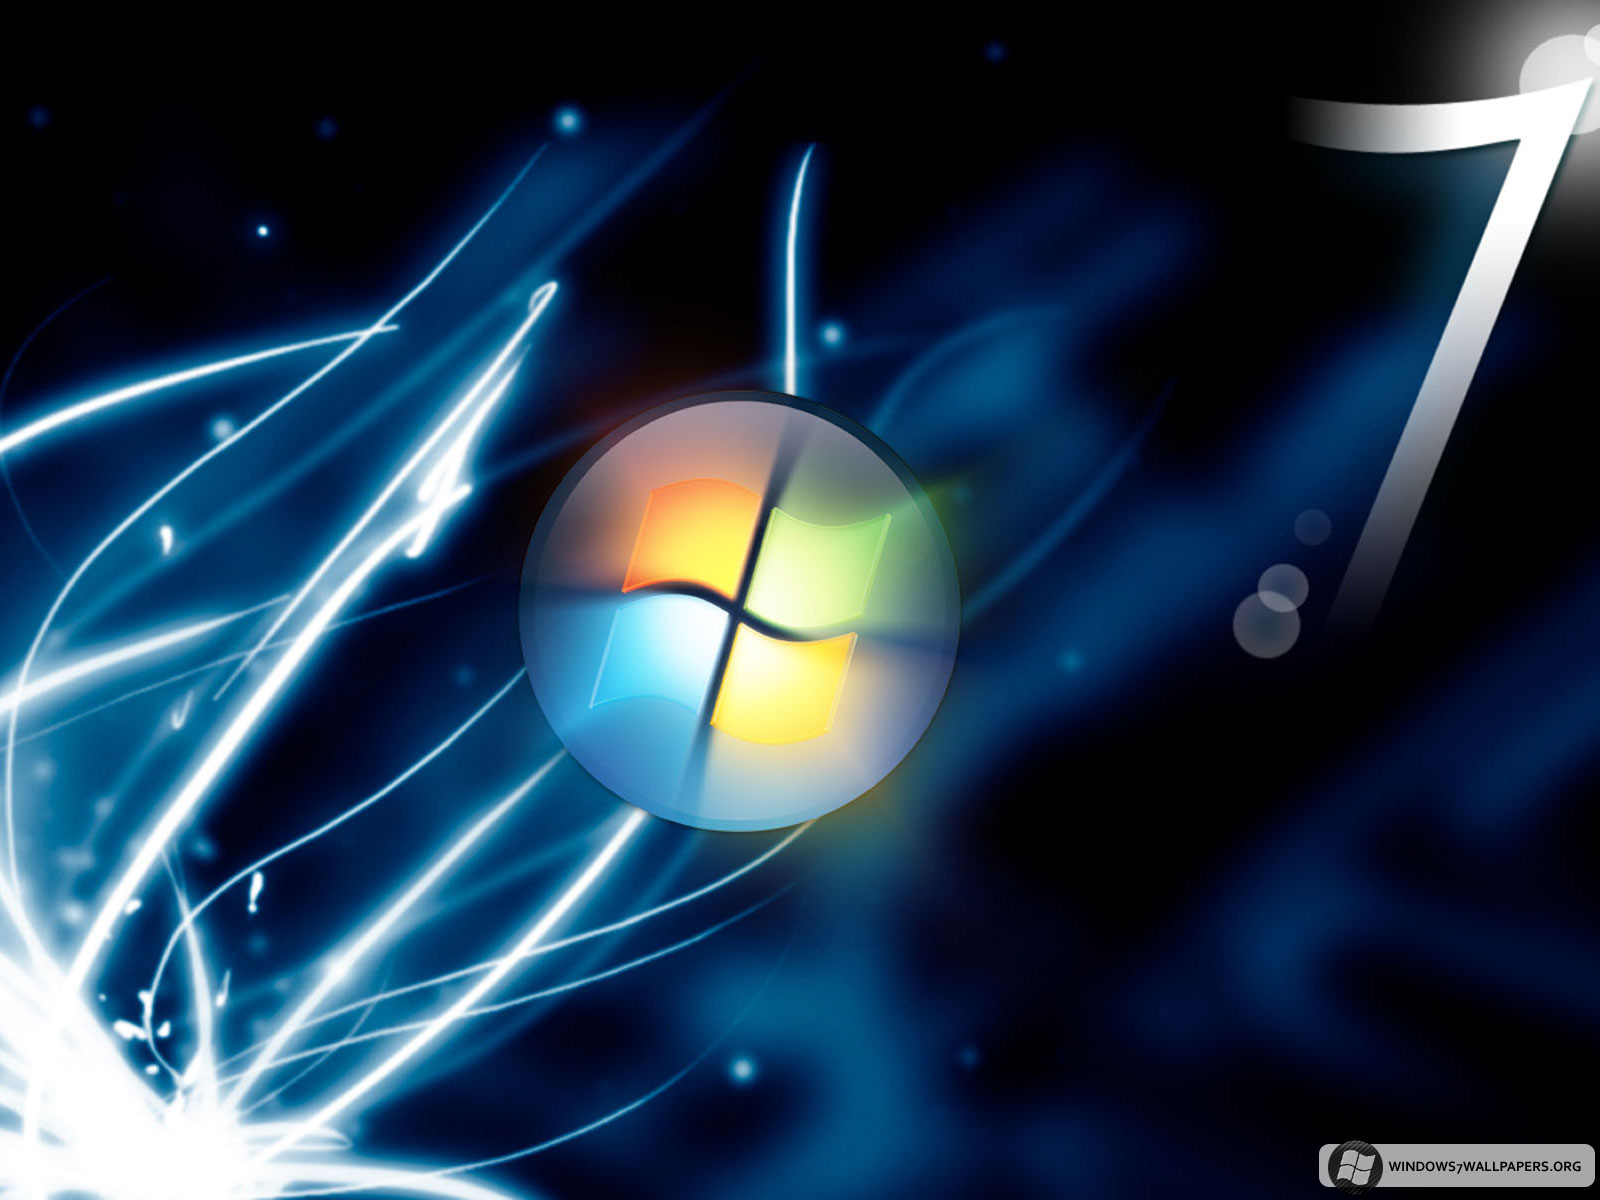 http://1.bp.blogspot.com/-1XEGH8MBi-M/UEWtrZk271I/AAAAAAAAAqg/4z8NuusTFxE/s1600/Windows+Se7en+3D+HD+Wallpapers.jpg